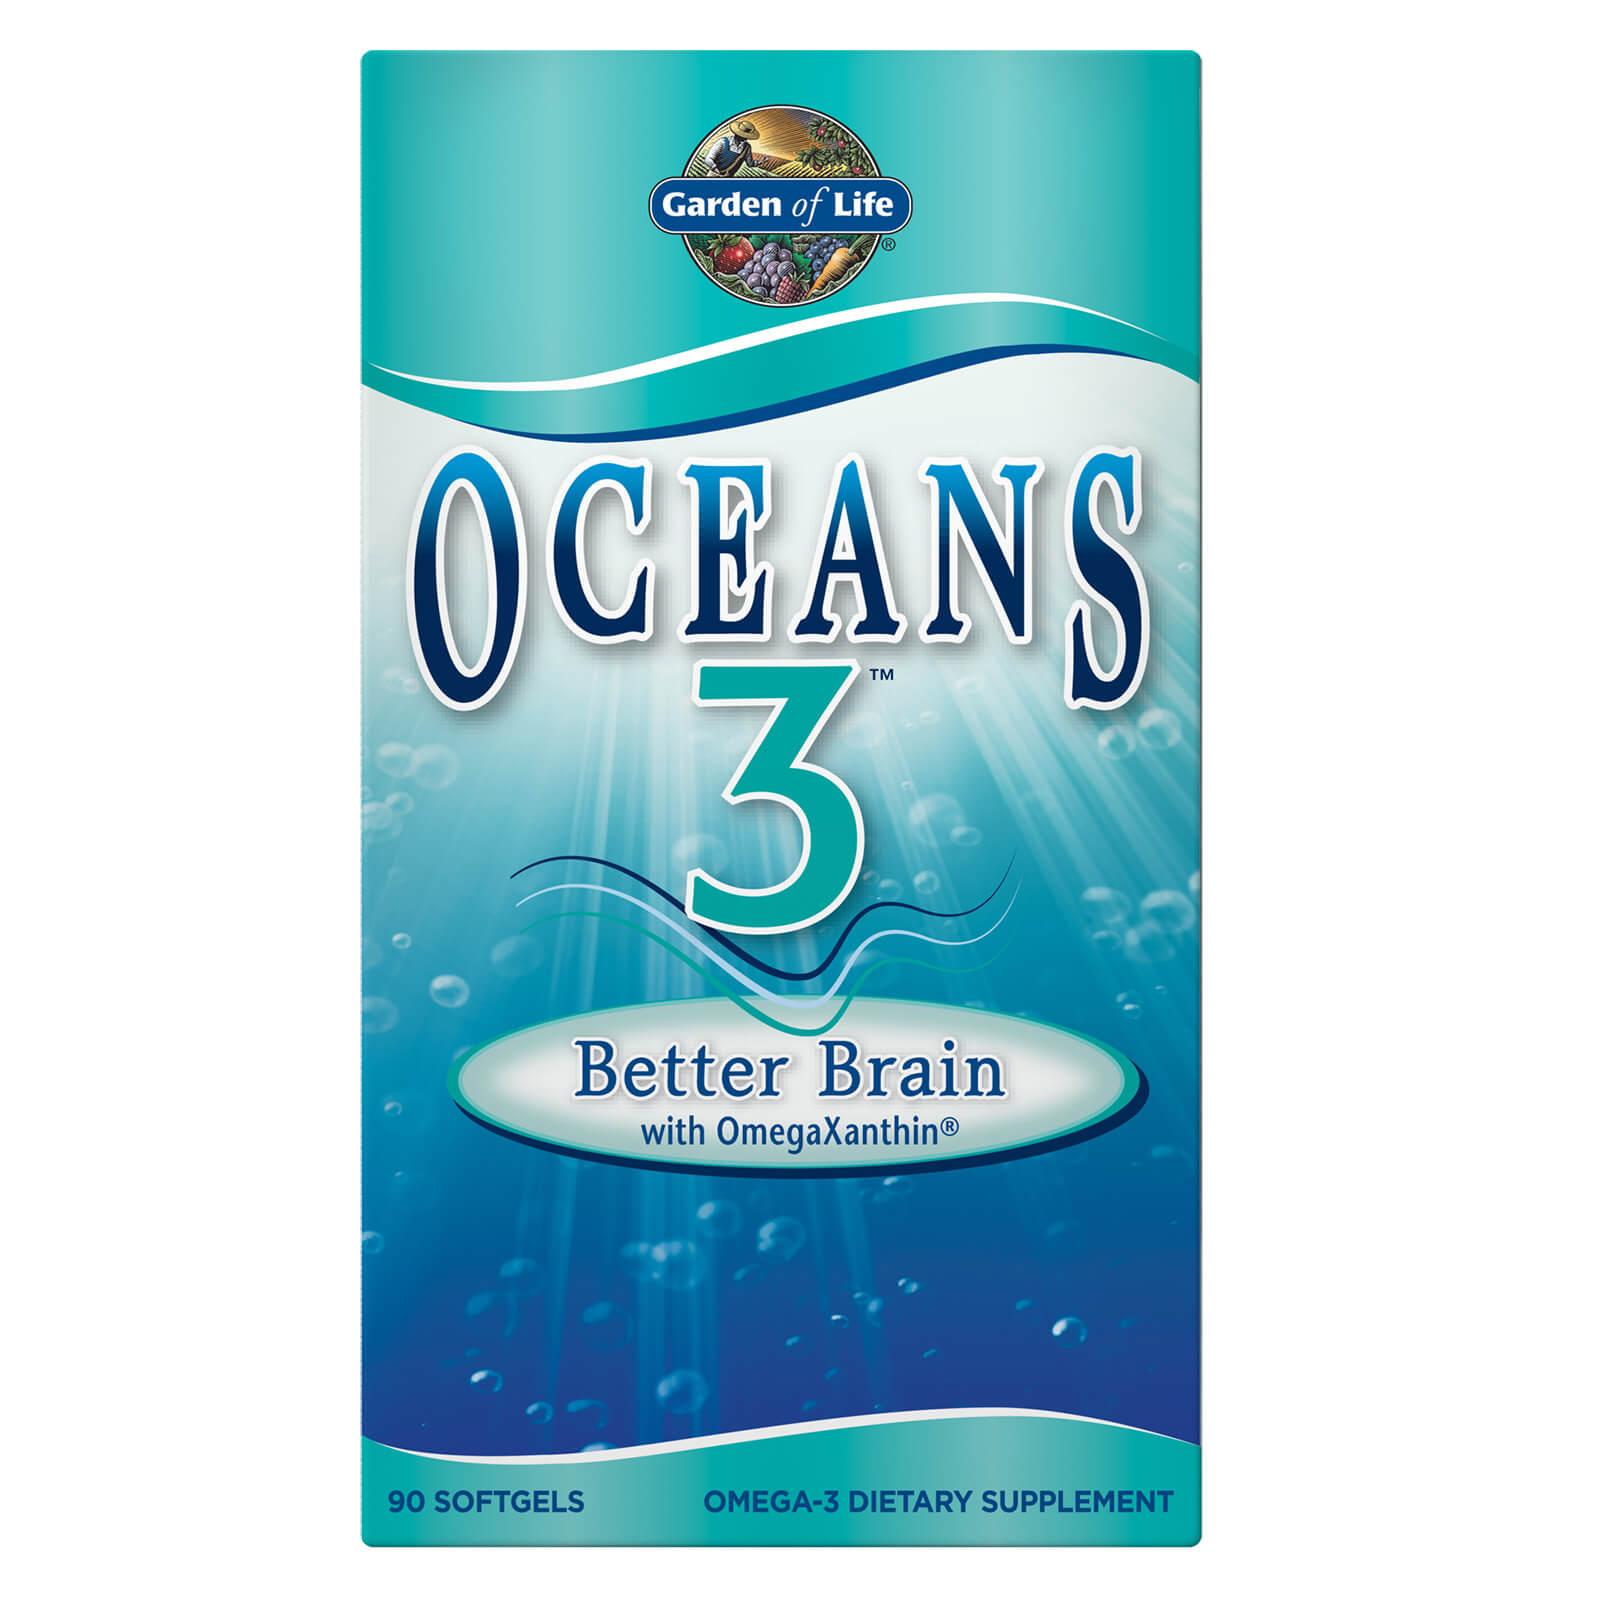 Oceans 3 - Better Brain Omega-3 with OmegaXanthin - 90 Softgels